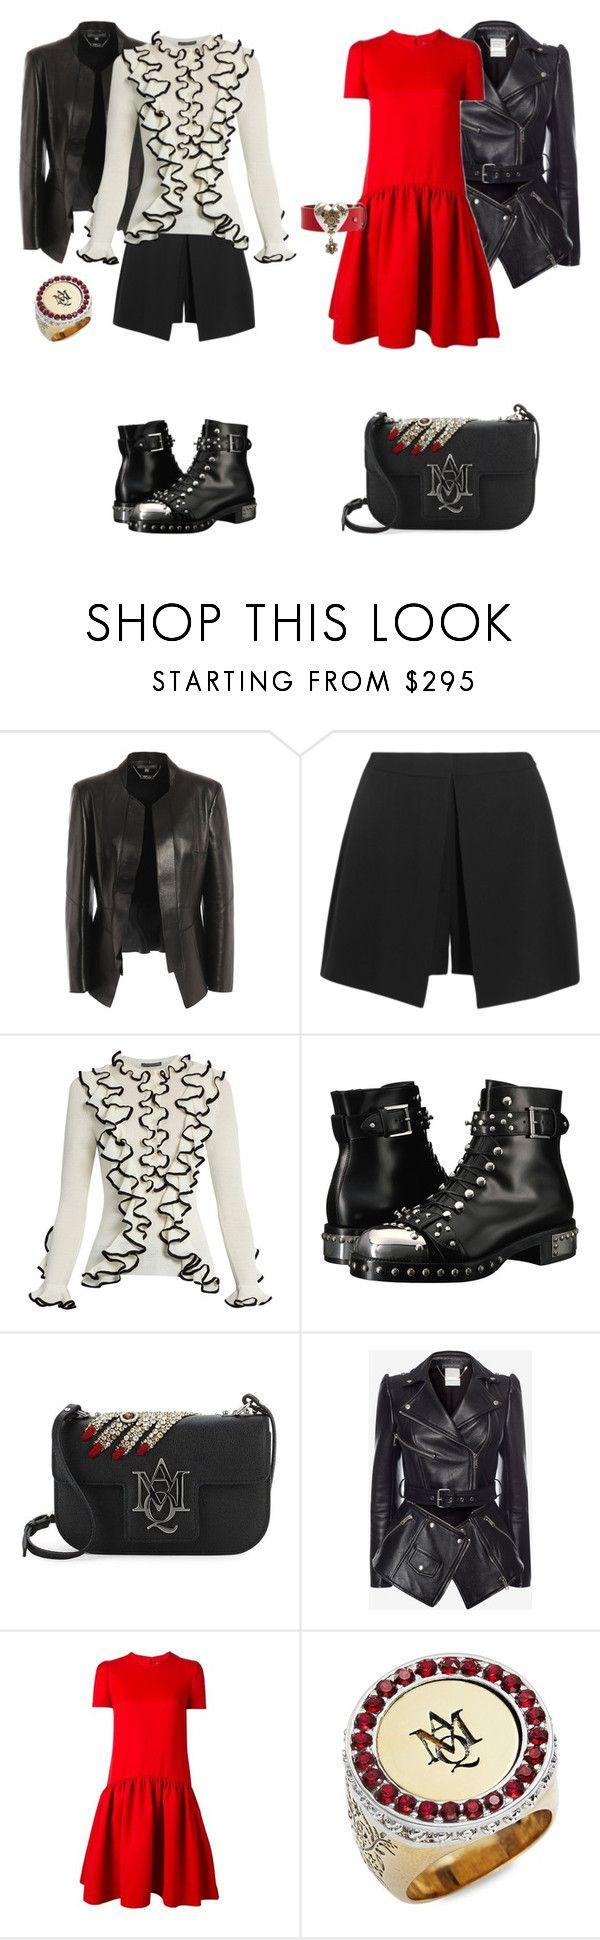 Alexander McQueen - total look by repriza on Polyvore featuring мода and Alexander McQueen. Два лука от Александра Маккуина в стиле рок-шик. Черные кожаные куртки, брутальные ботинки и сумка с цитатой Скиапарелли.